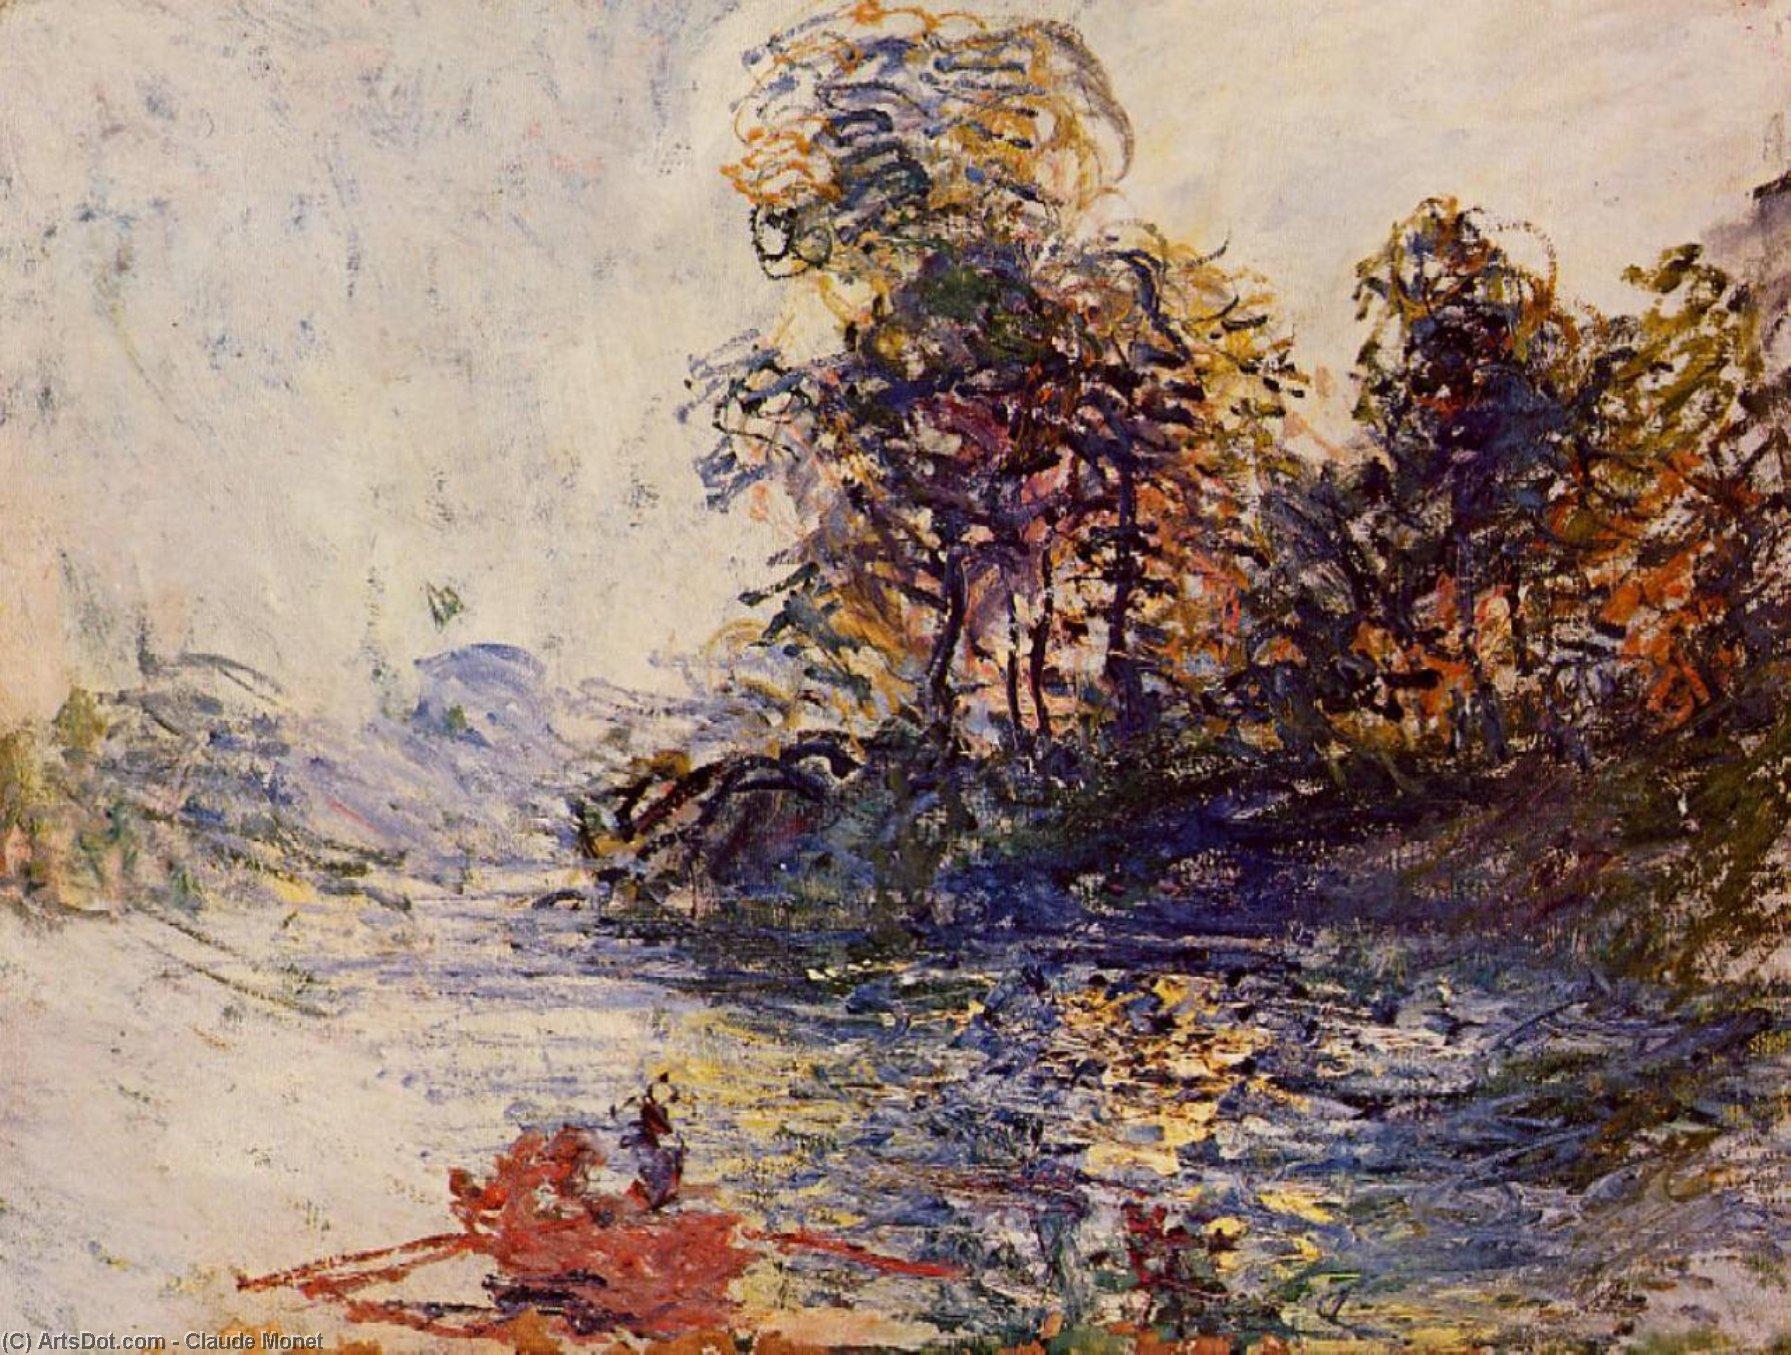 Wikioo.org - สารานุกรมวิจิตรศิลป์ - จิตรกรรม Claude Monet - The River